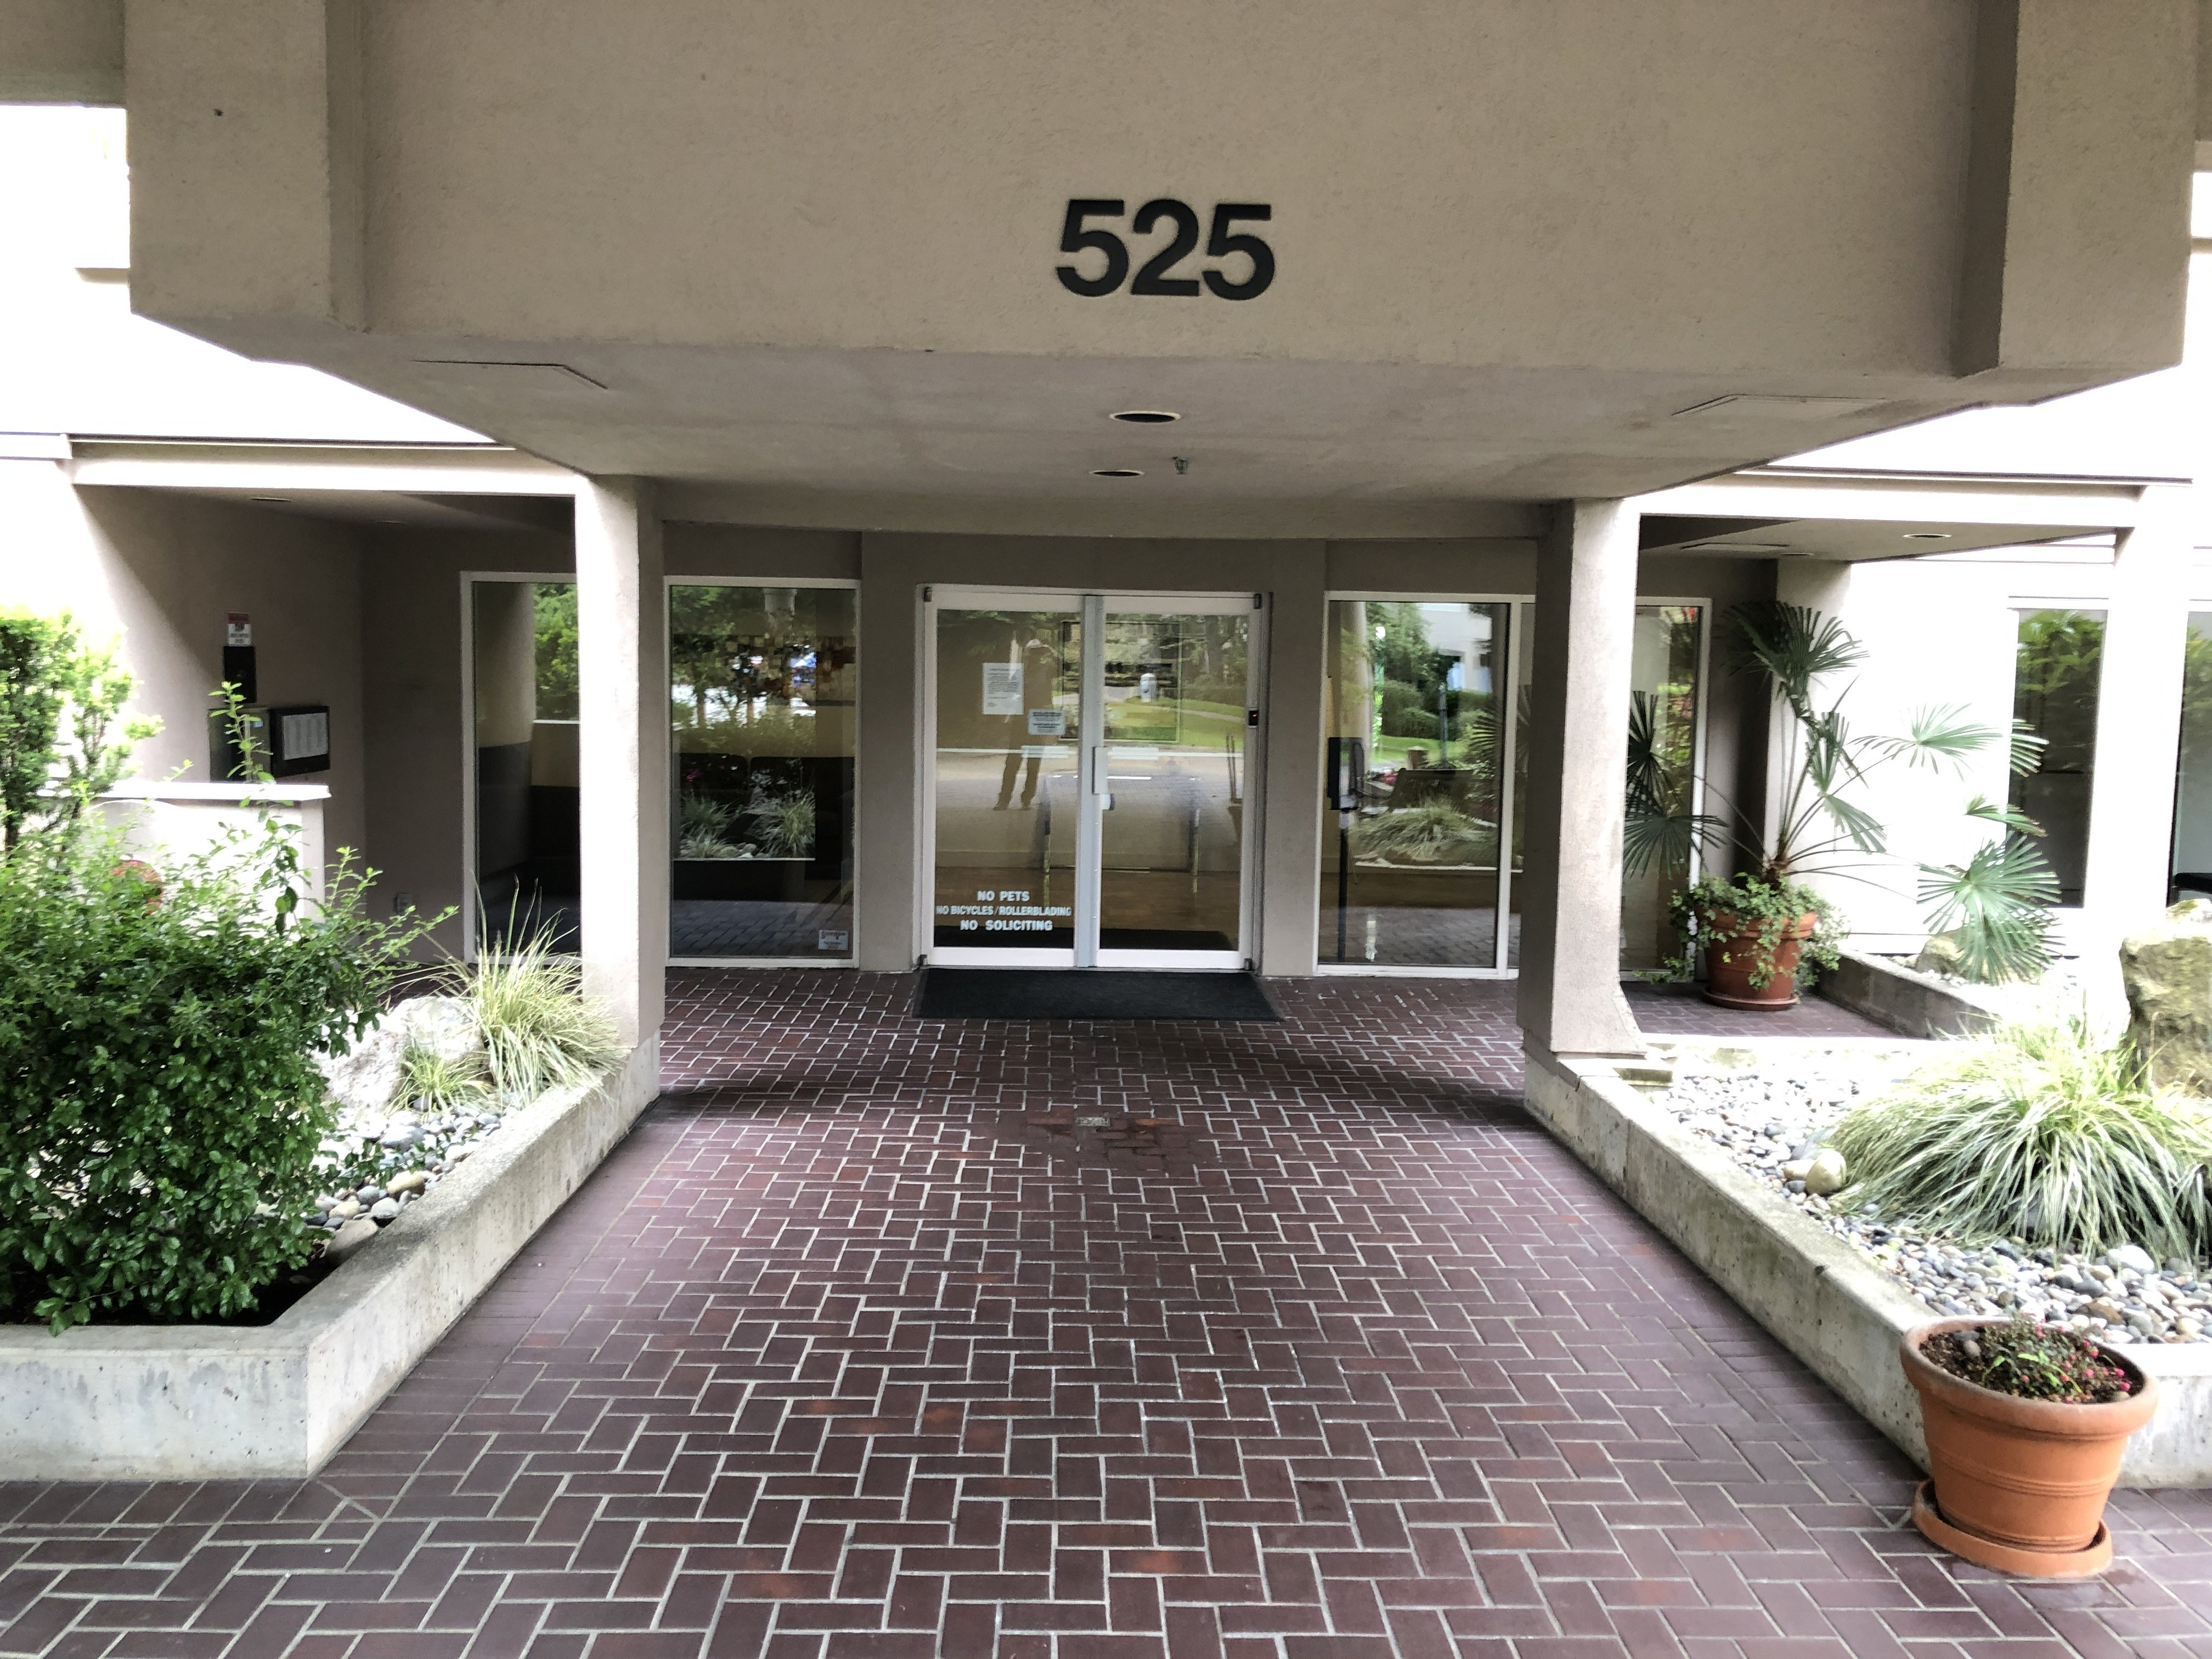 Henley Court - 525 Wheelhouse Square!